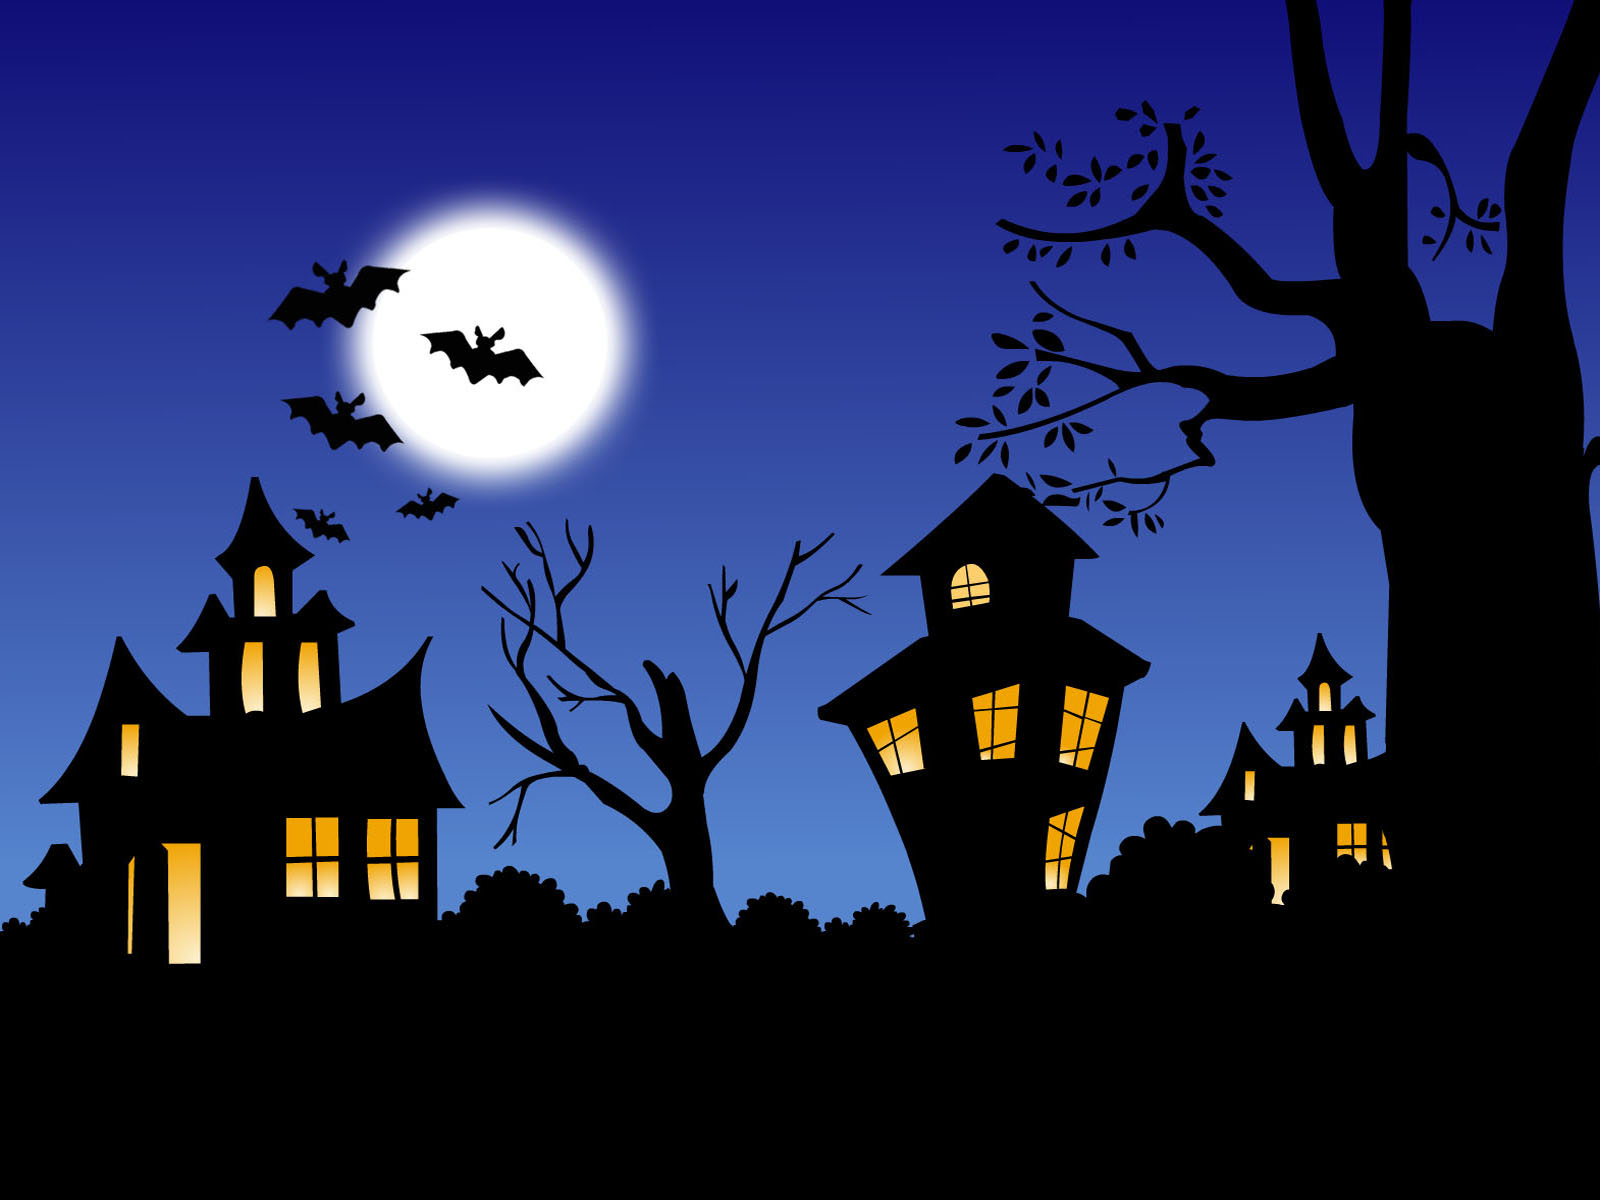 Halloween Wallpaper Background - WallpaperSafari